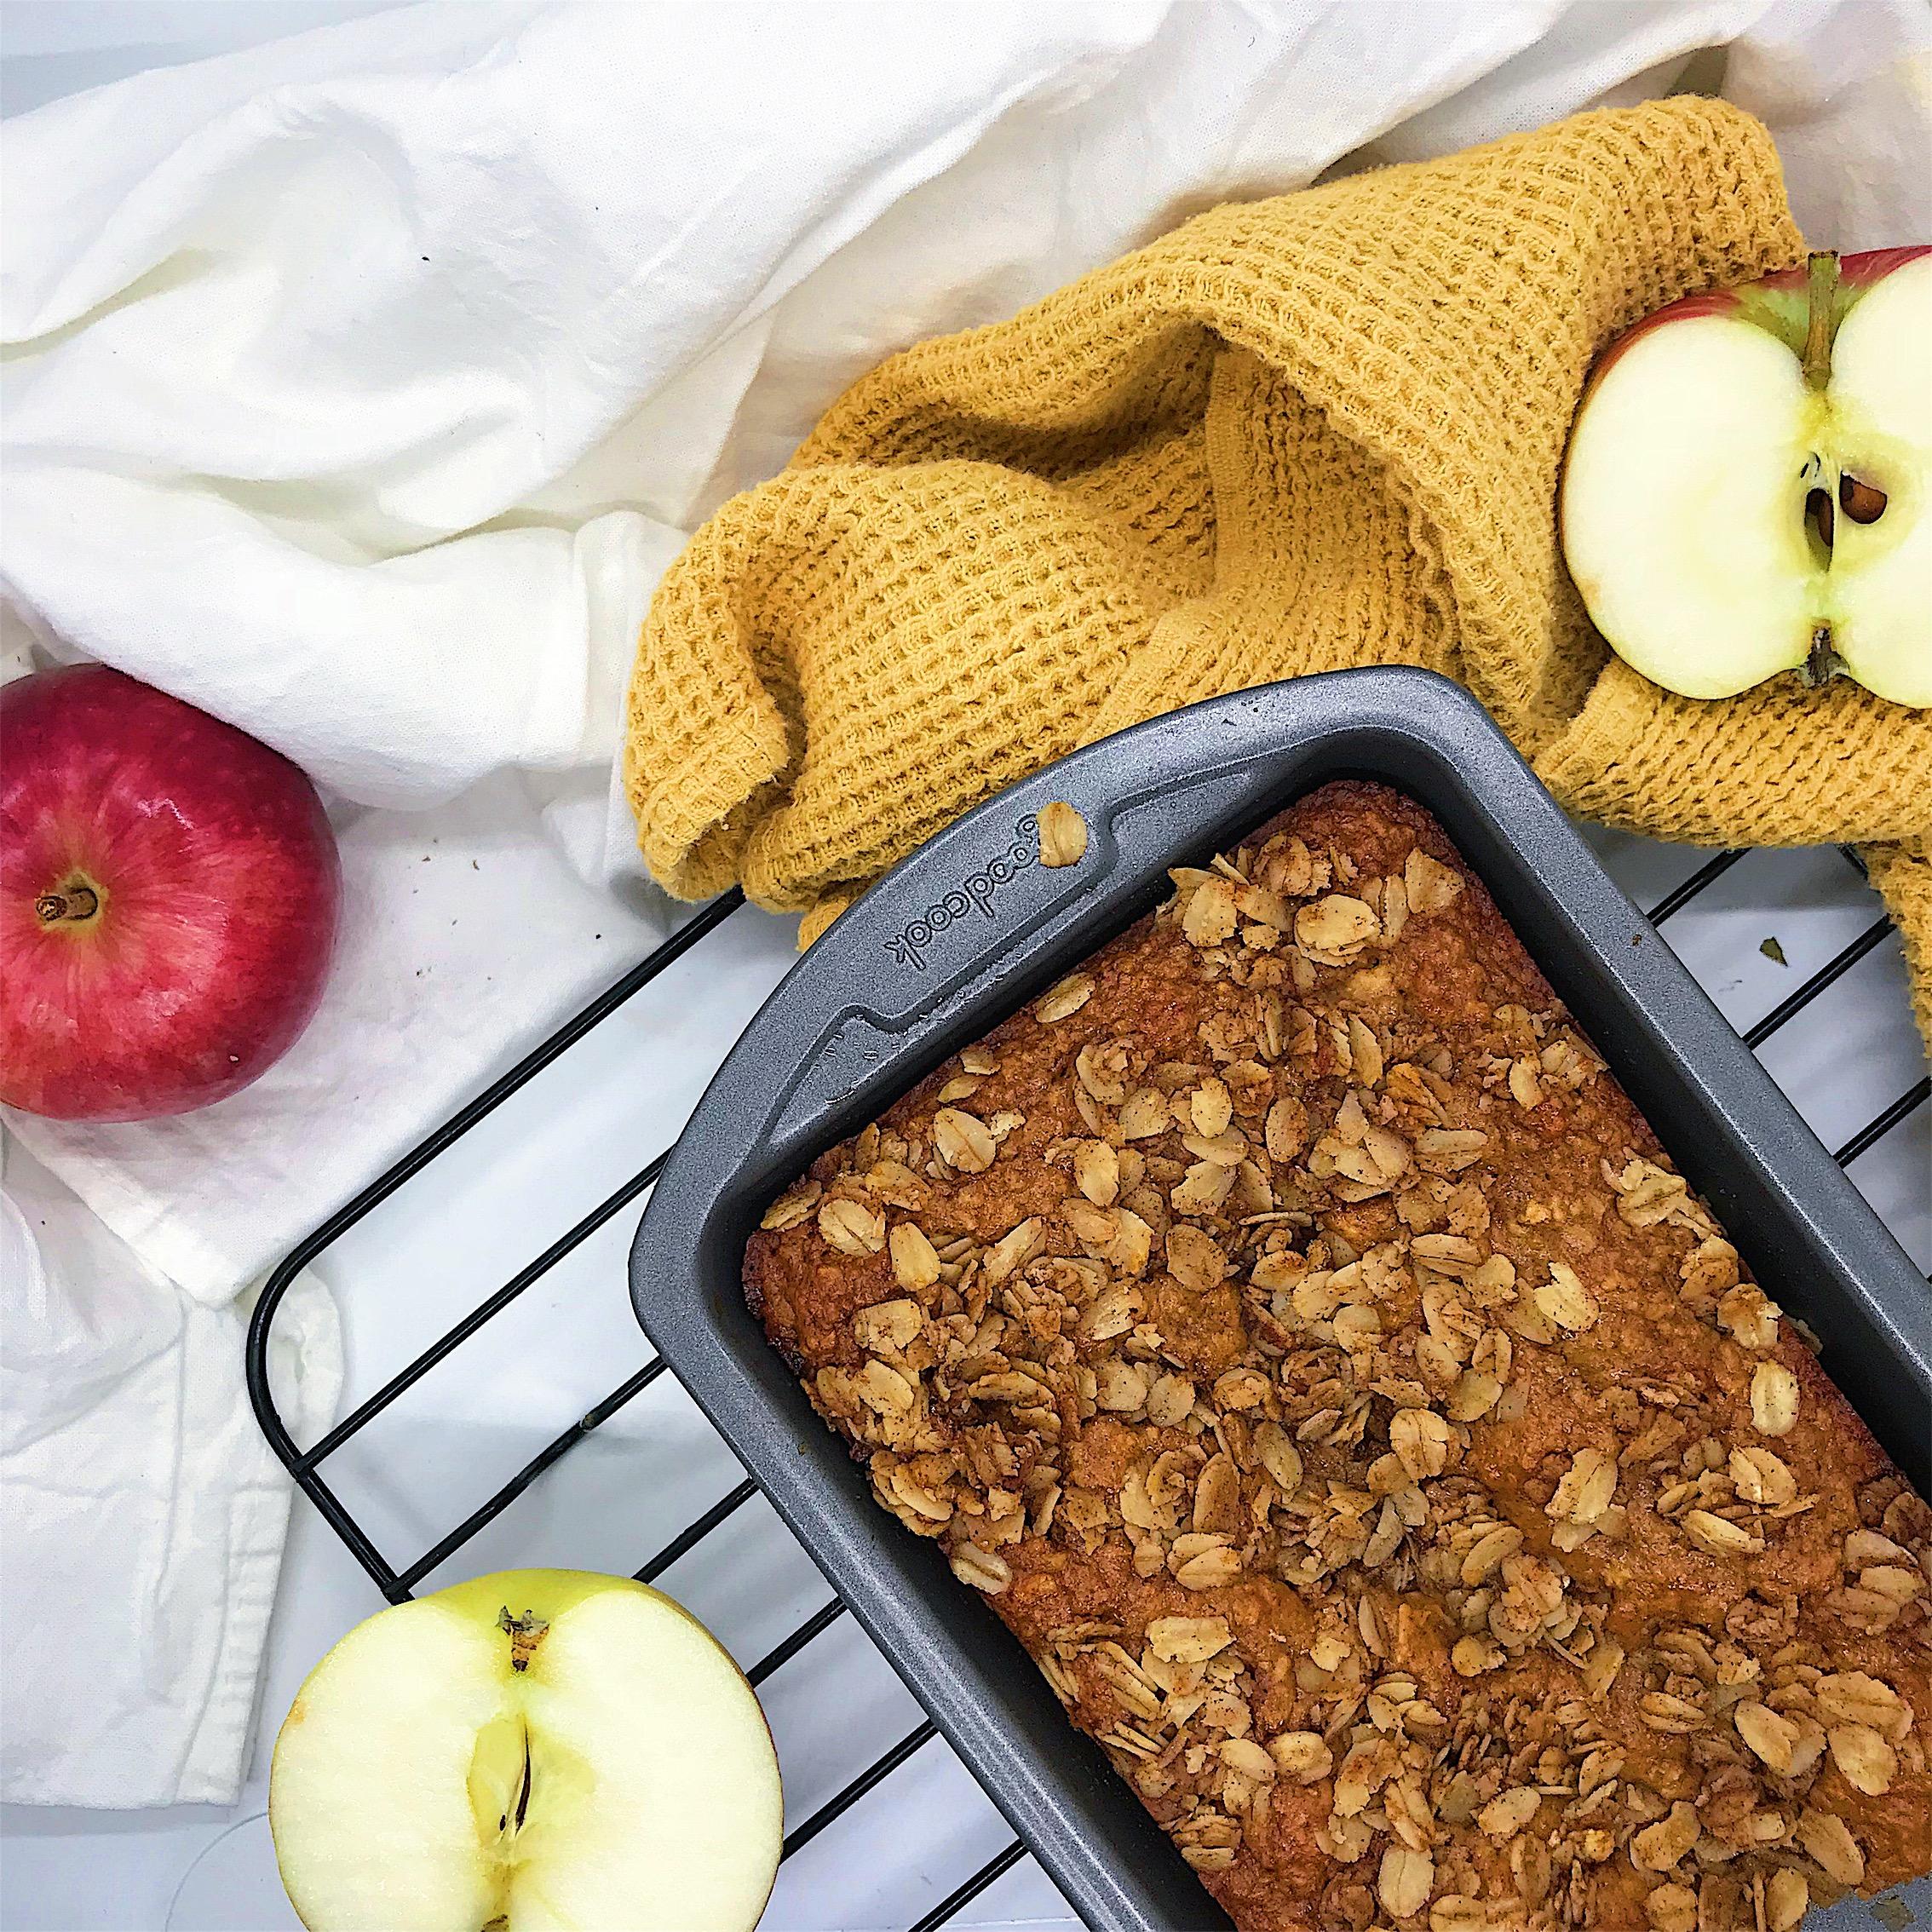 Delicious apple cinnamon bread that tastes like apple crisp! the perfect healthy fall treat.